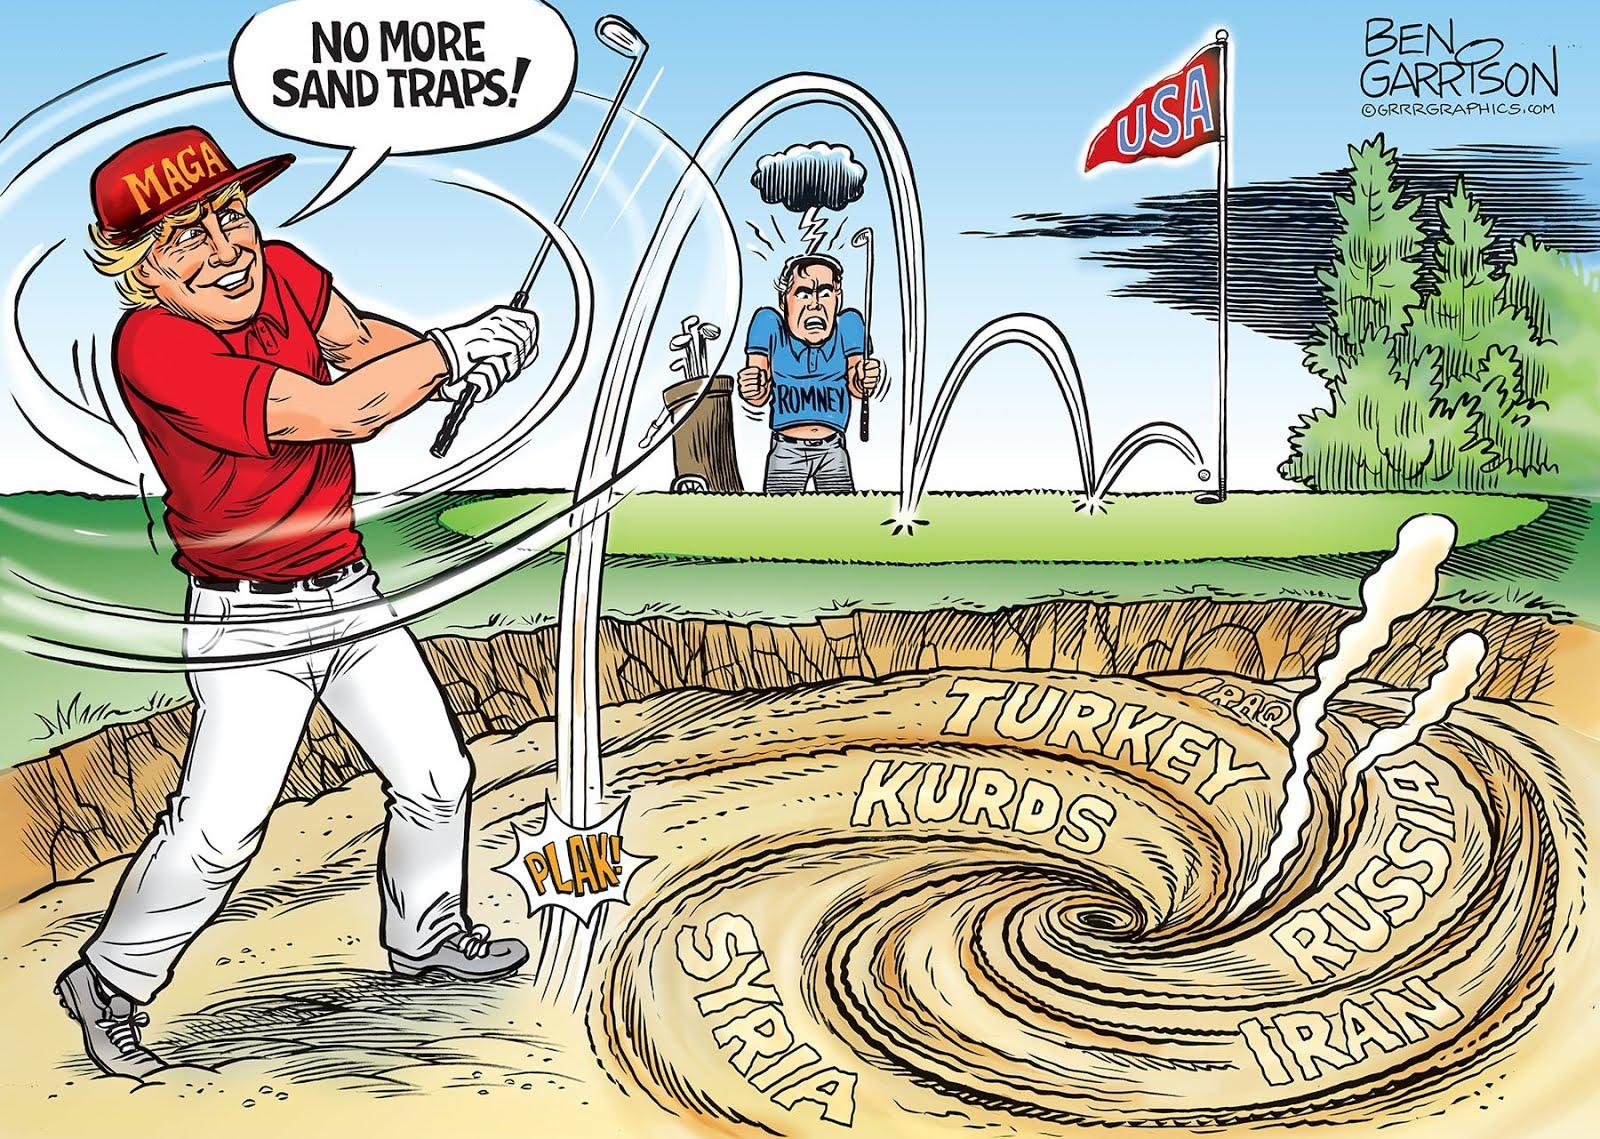 Trump' sand traps